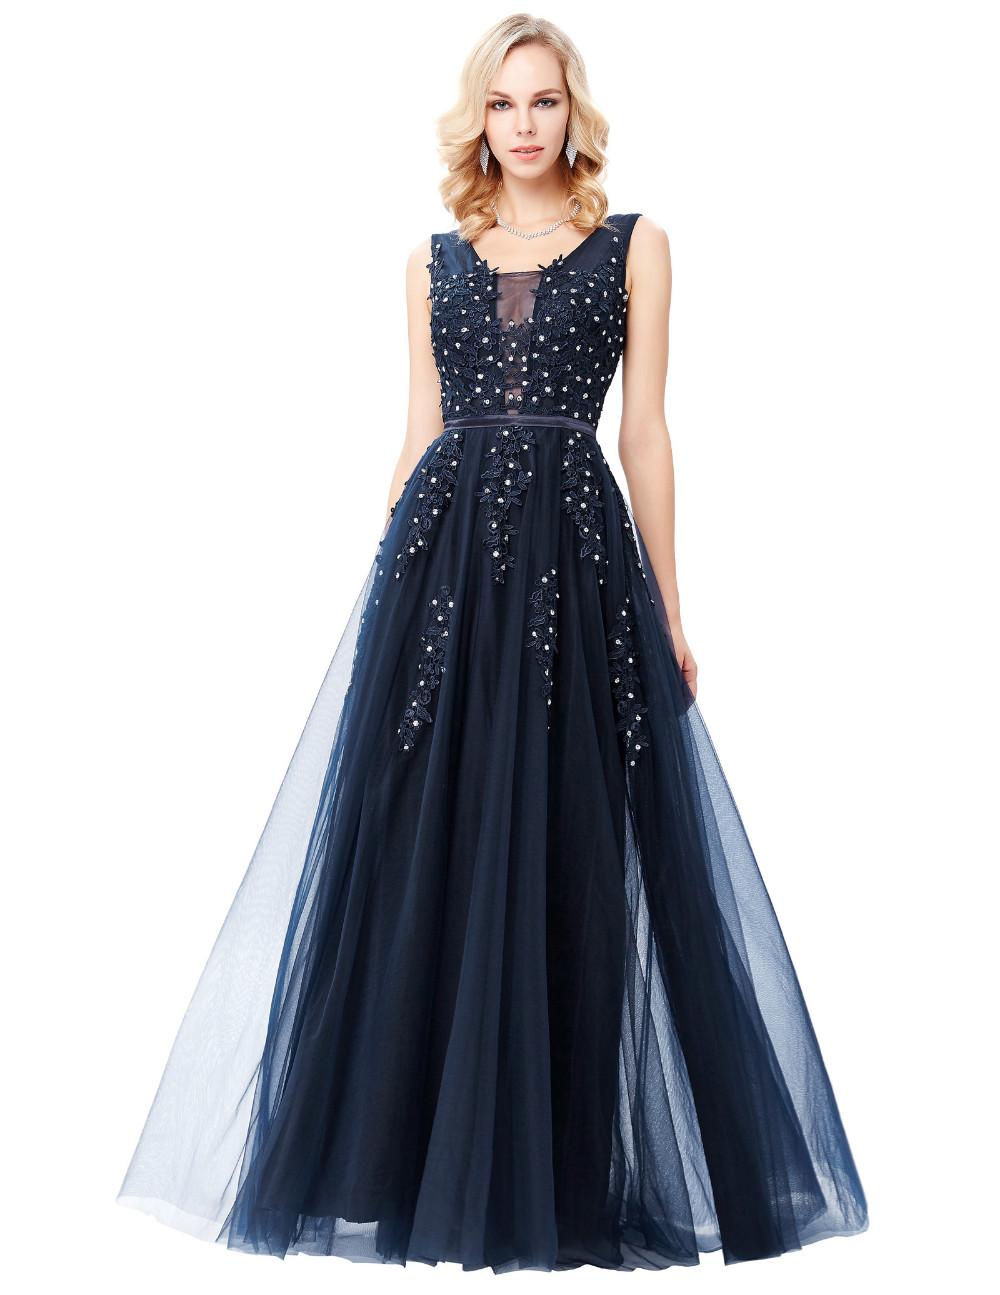 Grace Karin Tulle Appliques Celebrity Prom Dress Sexy V Back Sleeveless Long Royal Blue Robes De Soiree 2017 Longue Prom Dresses 9